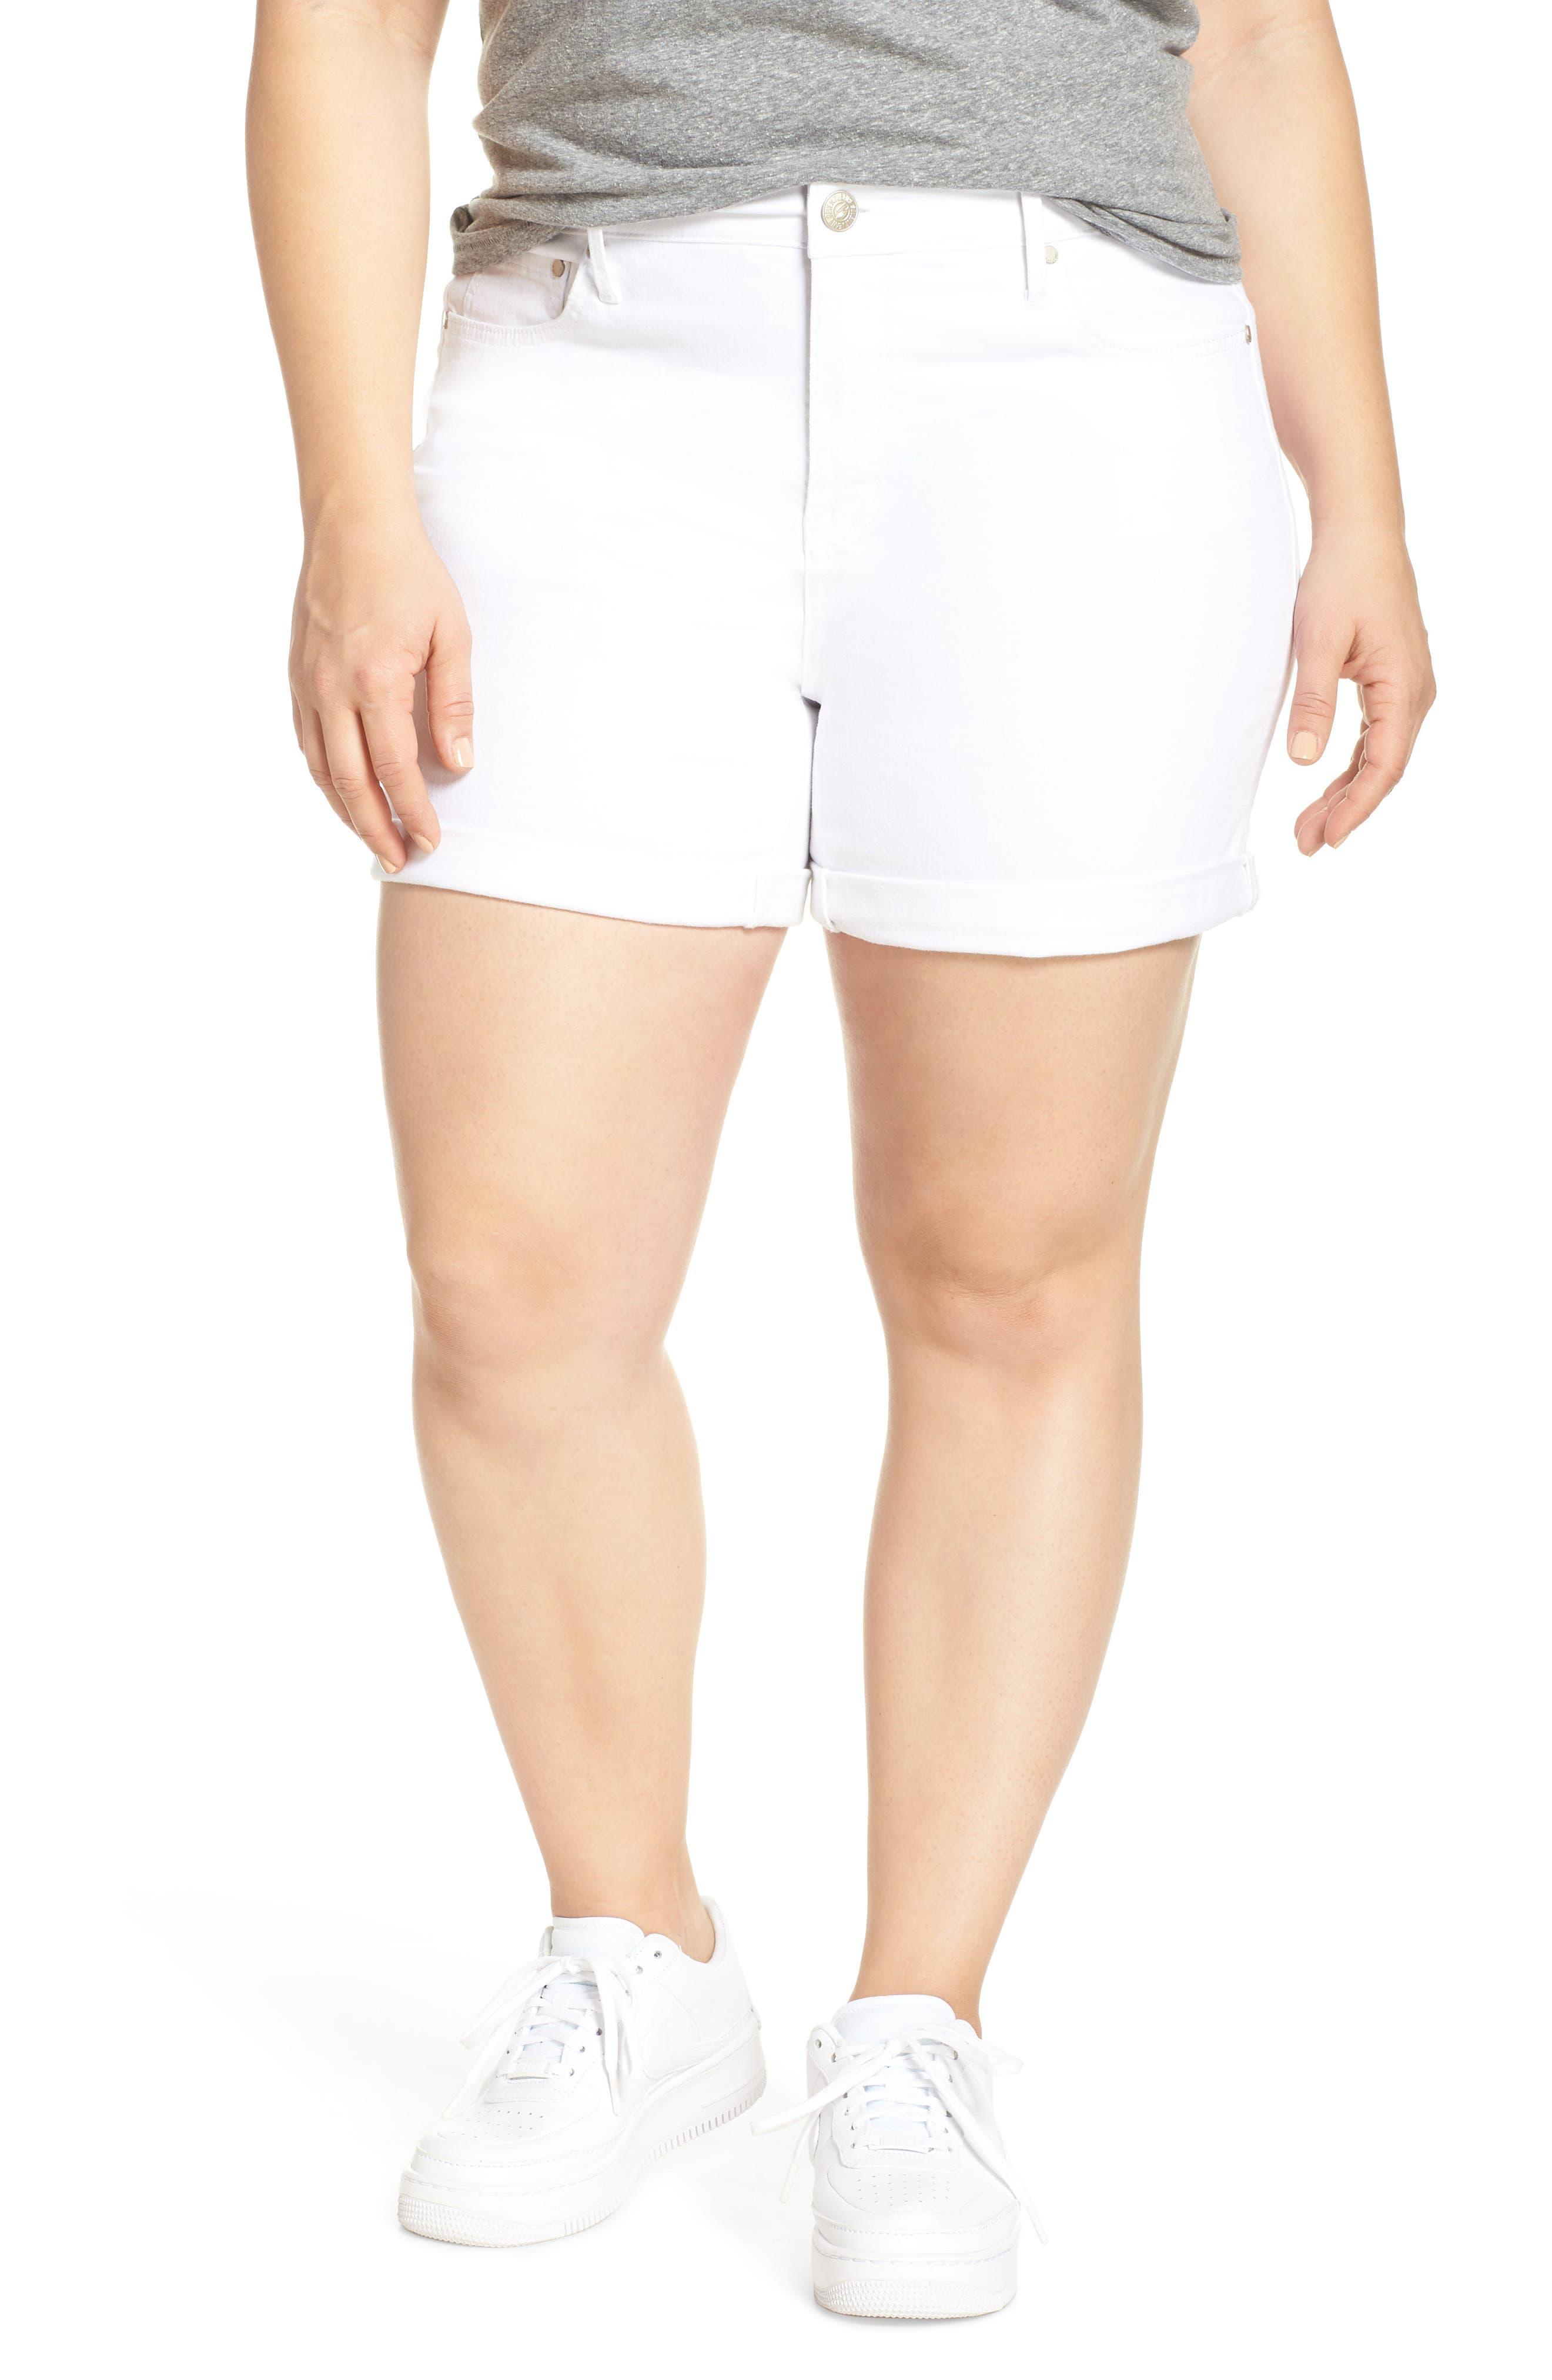 Plus Women's Seven7 High Waist Stretch Denim Shorts